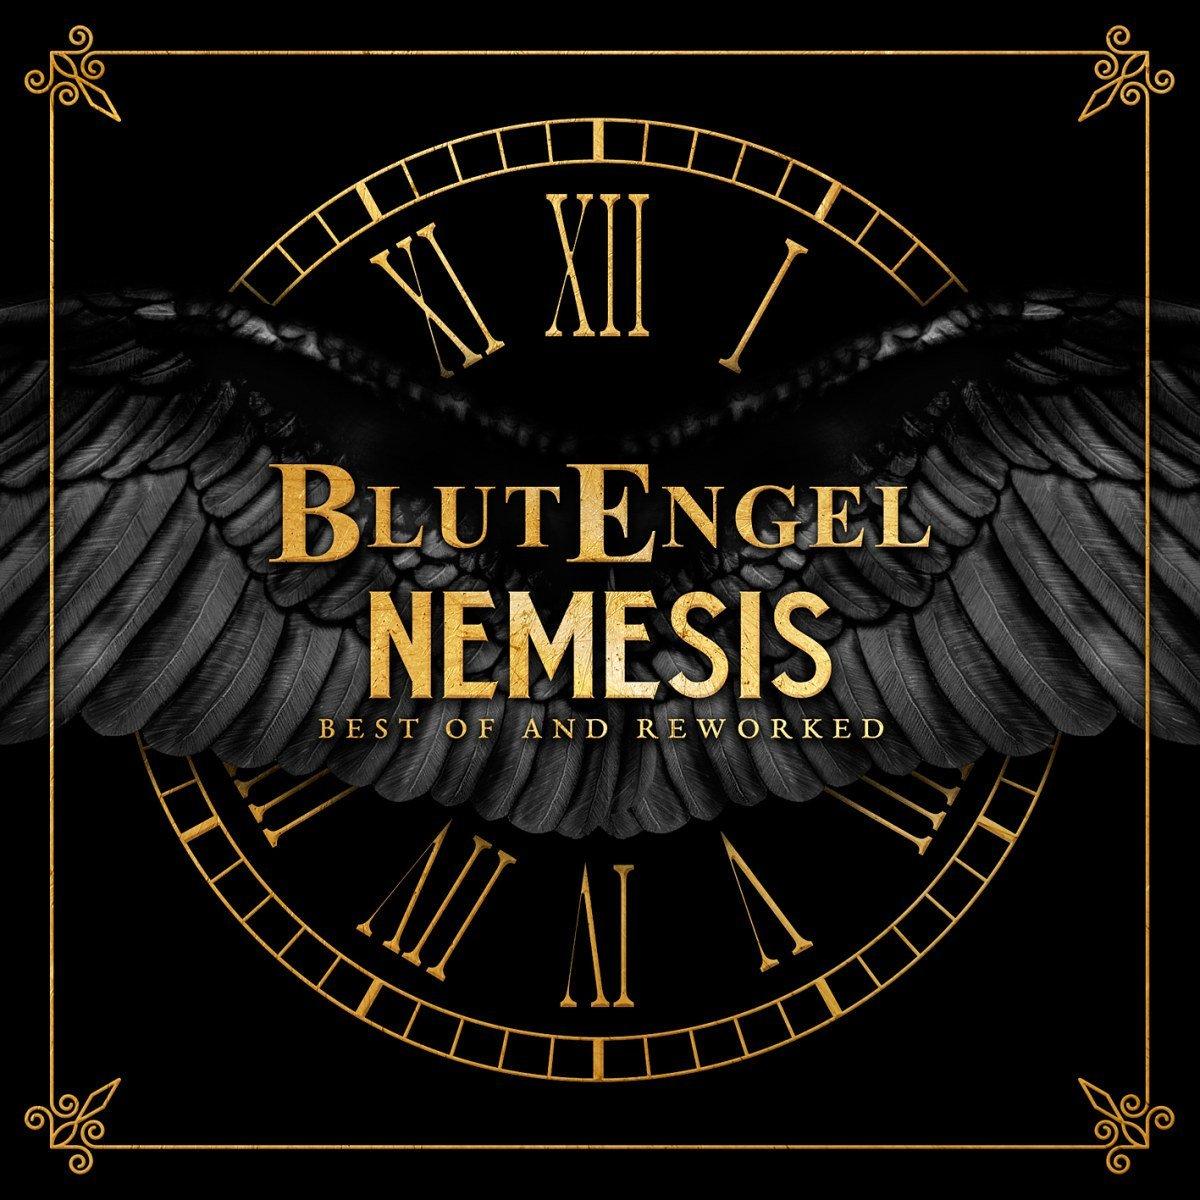 Blutengel: Nemesis (2016) Book Cover